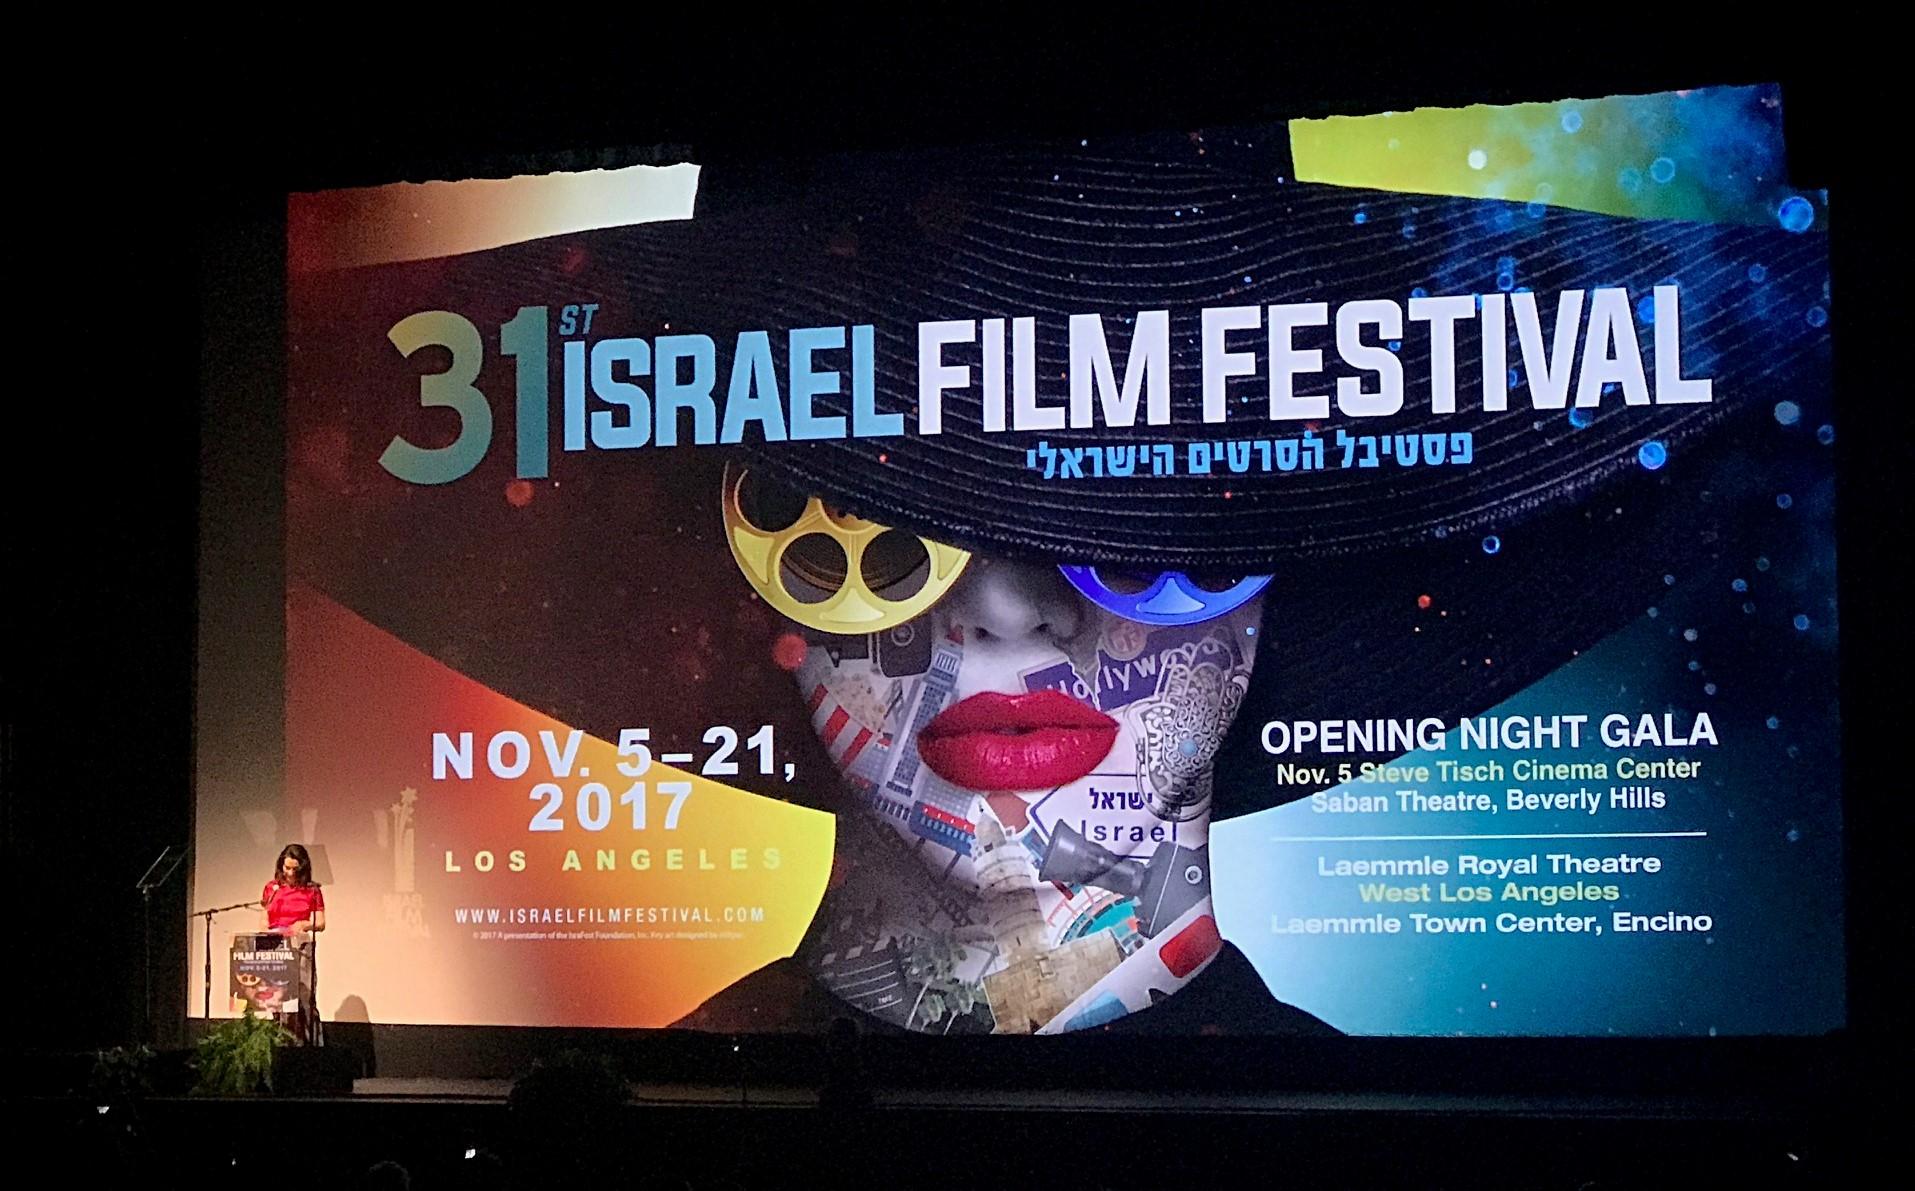 Israeli Film Festival פסטיבל הסרטים הישראלי